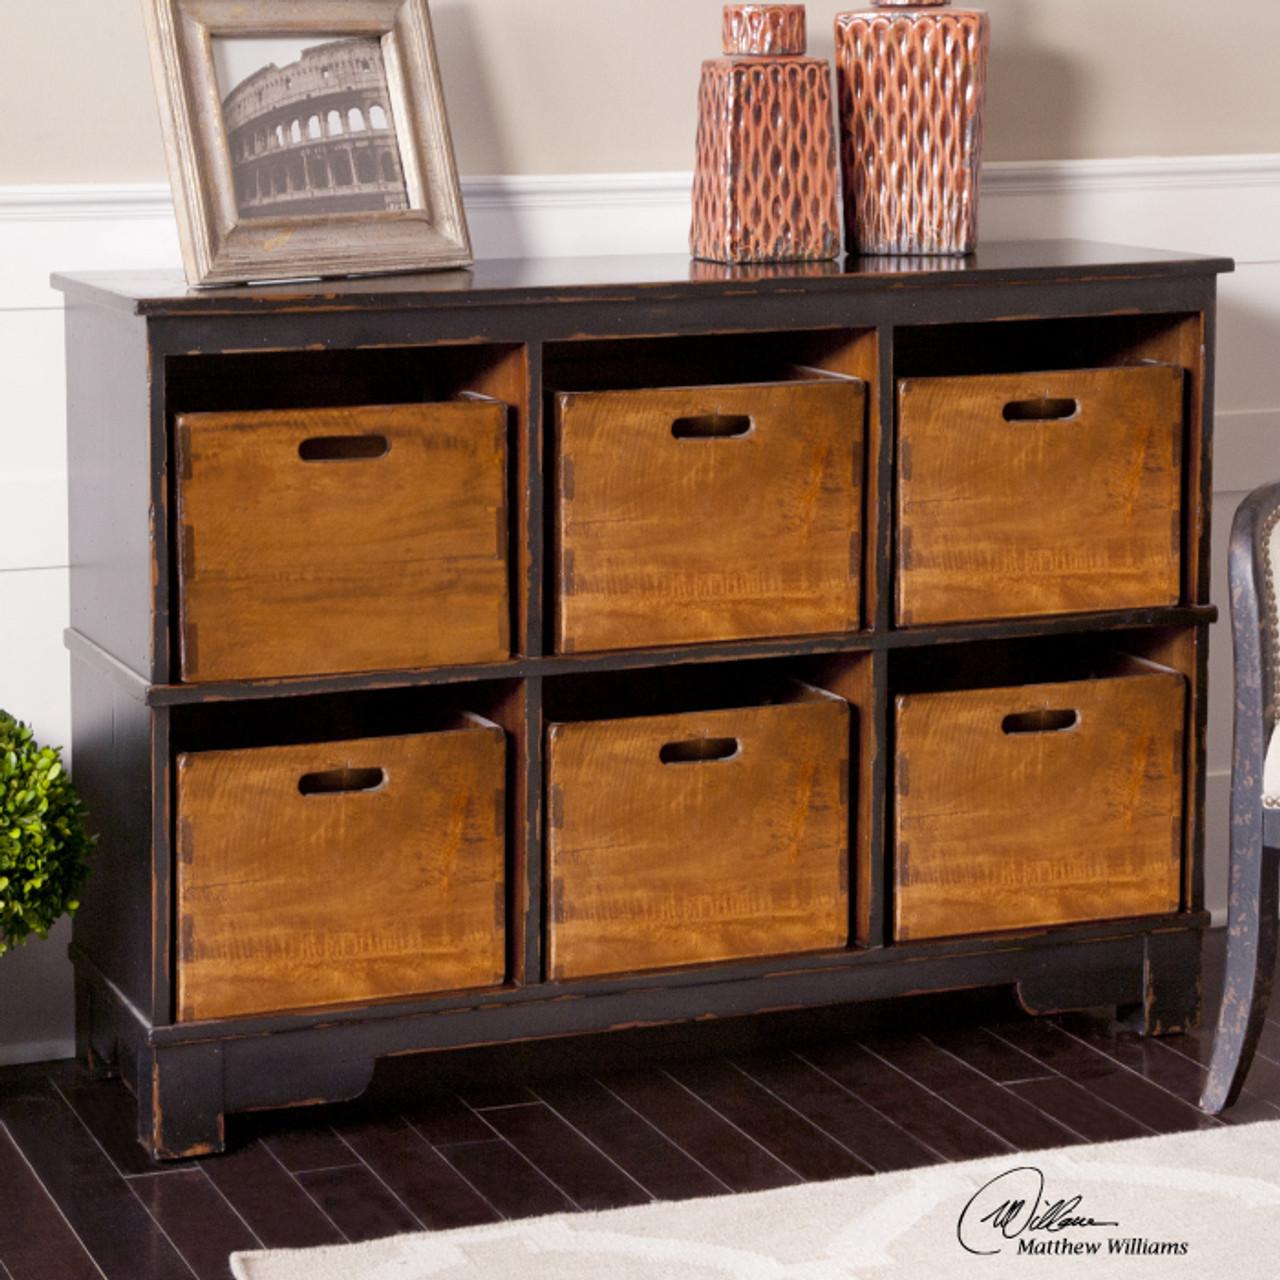 Outstanding Ardusin Solid Wood 6 Cubby Storage Machost Co Dining Chair Design Ideas Machostcouk